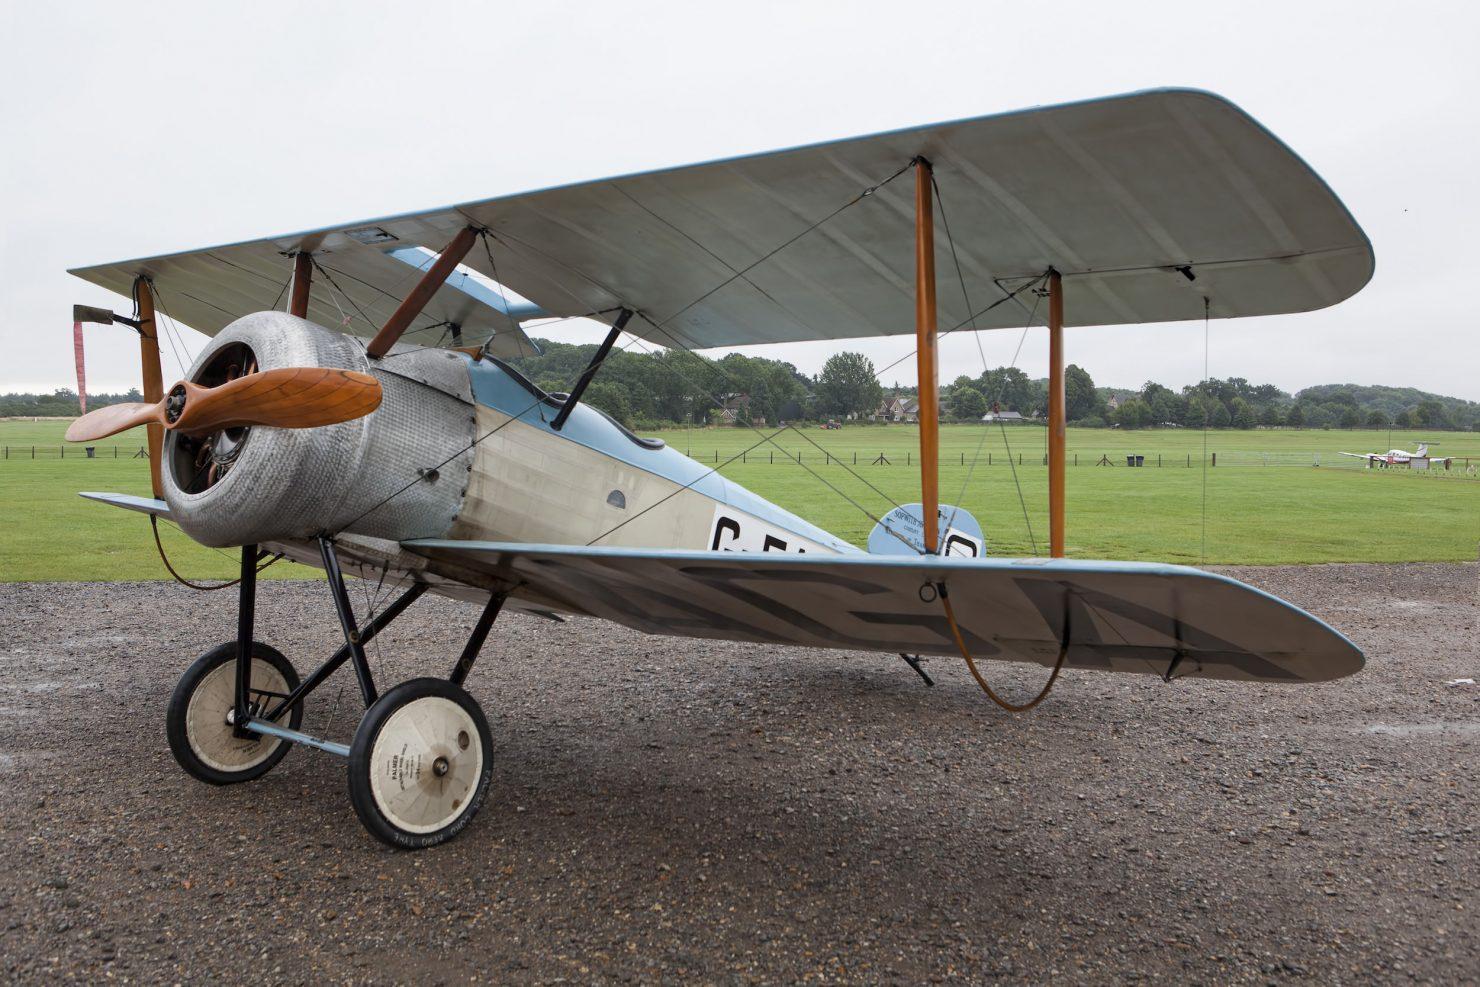 Sopwith Dove Two Seat Biplane 6 1480x987 - Sopwith Dove Biplane